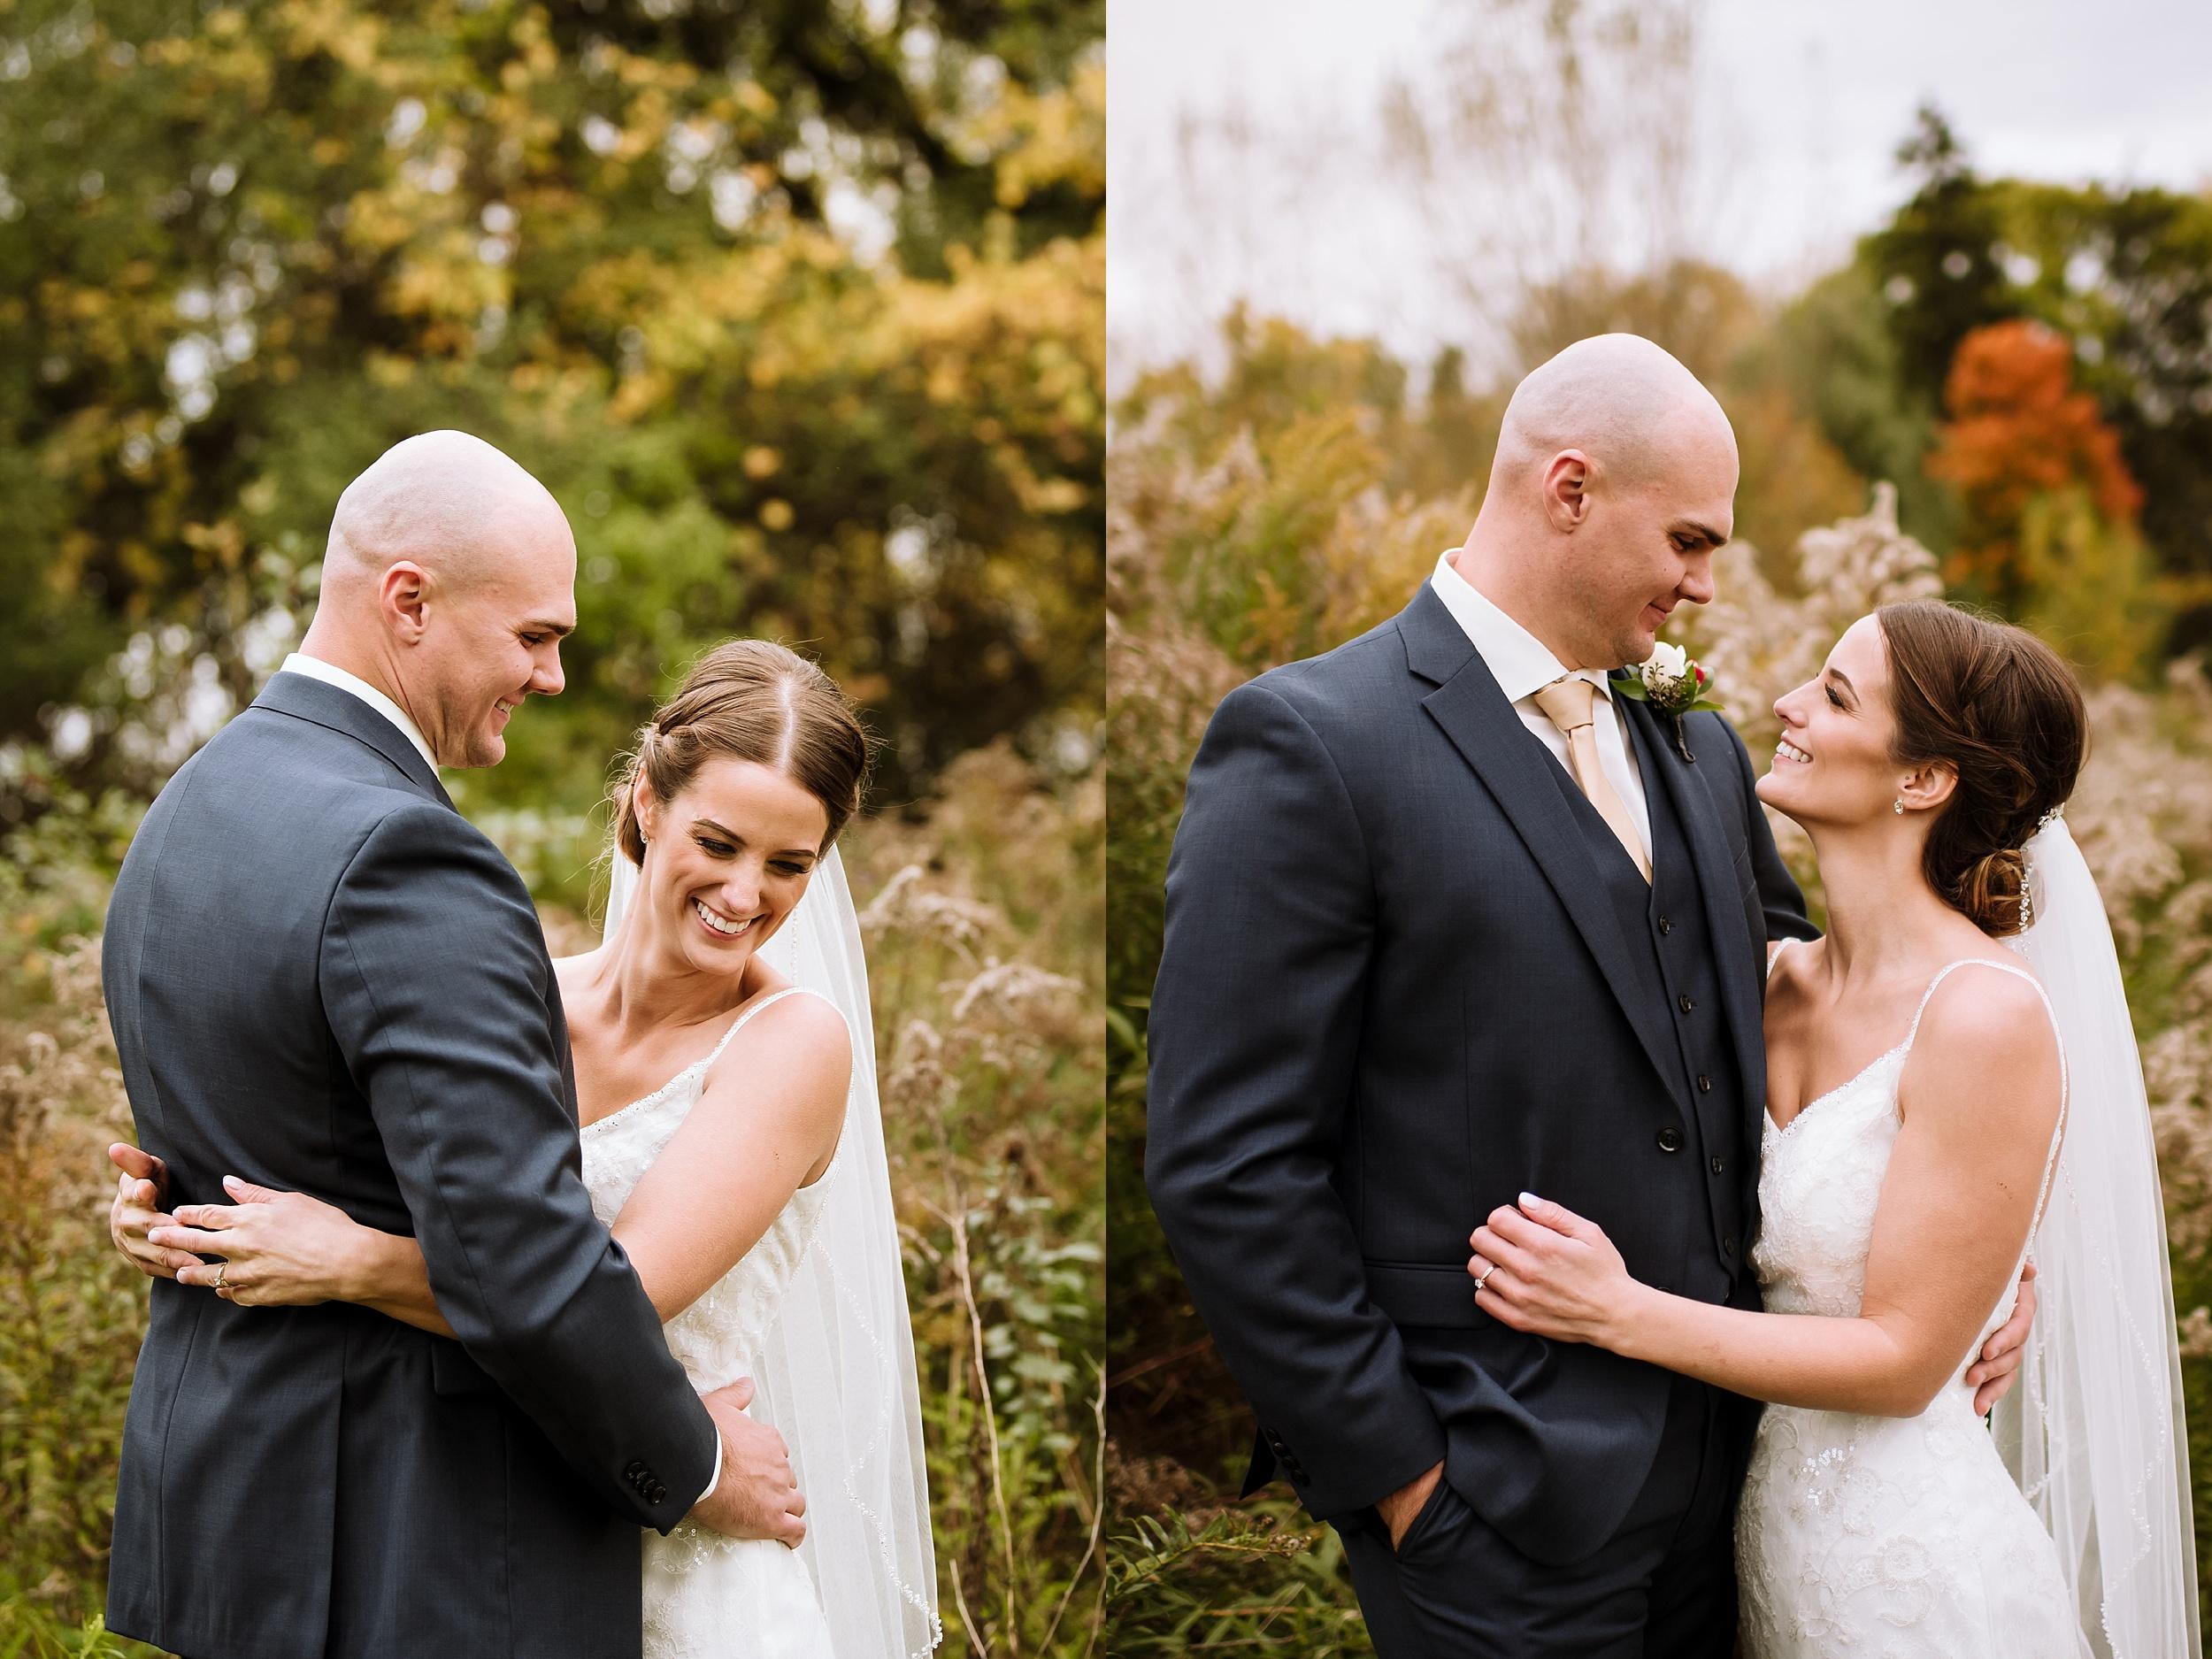 Windemere_Manor_Fall_Wedding_London_Toronto_Wedding_Photographer_0024.jpg